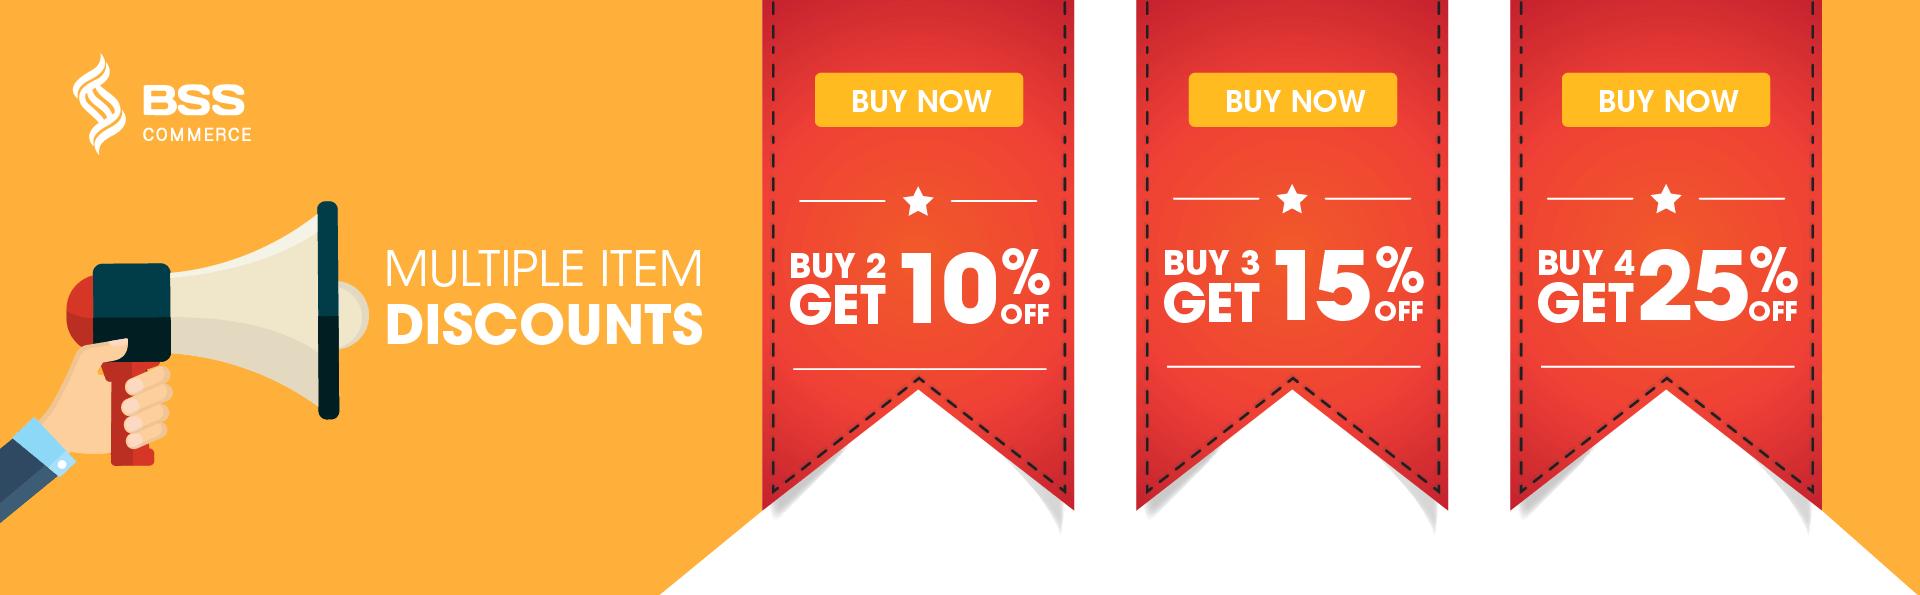 mutiple item discounts